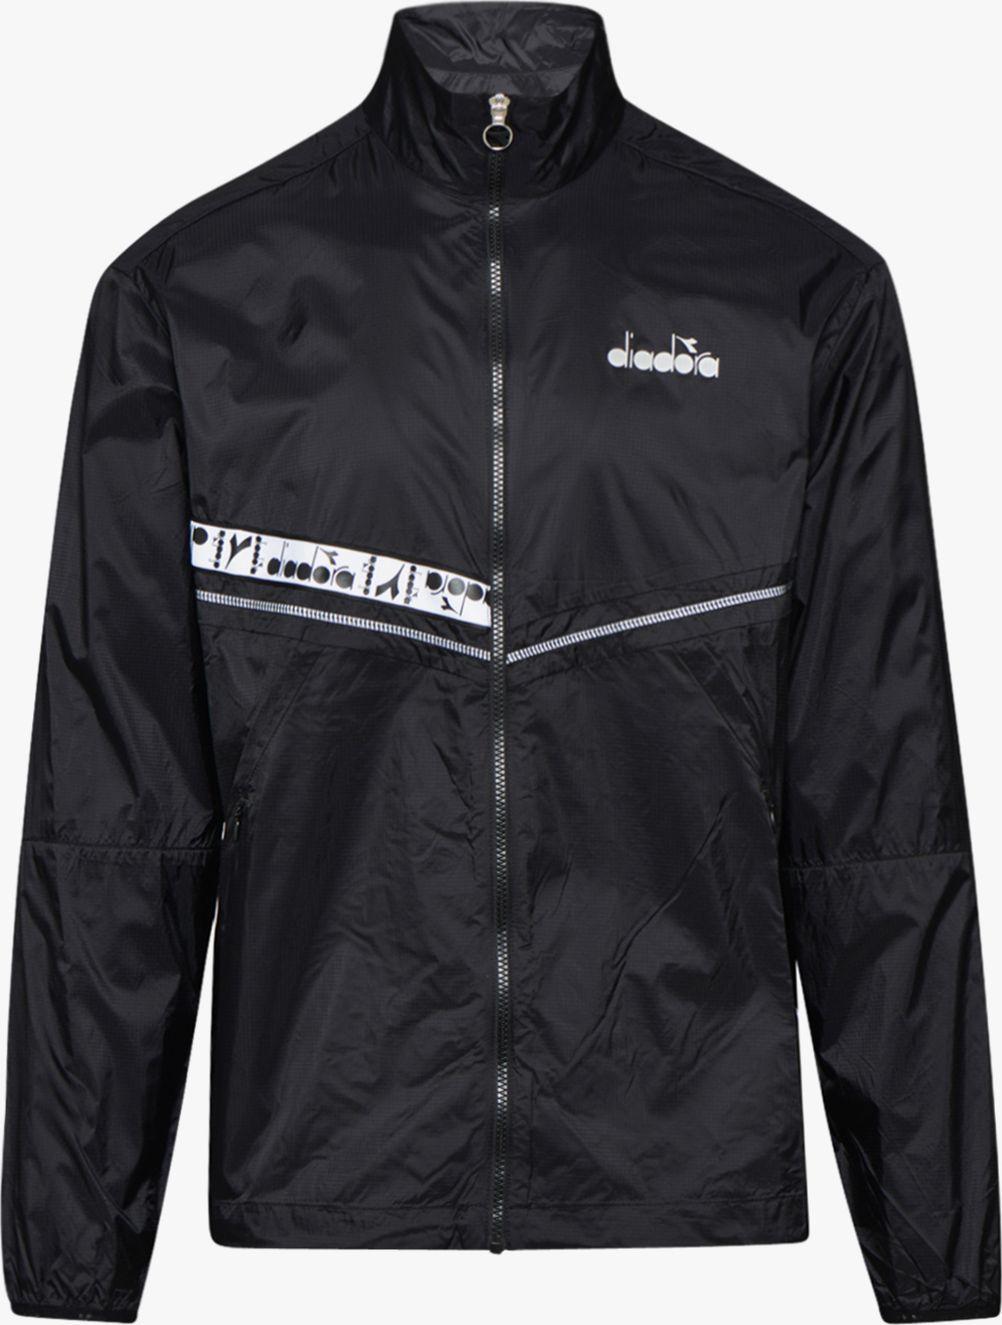 DIADORA Lightweight Wind Jacket Be One Black M